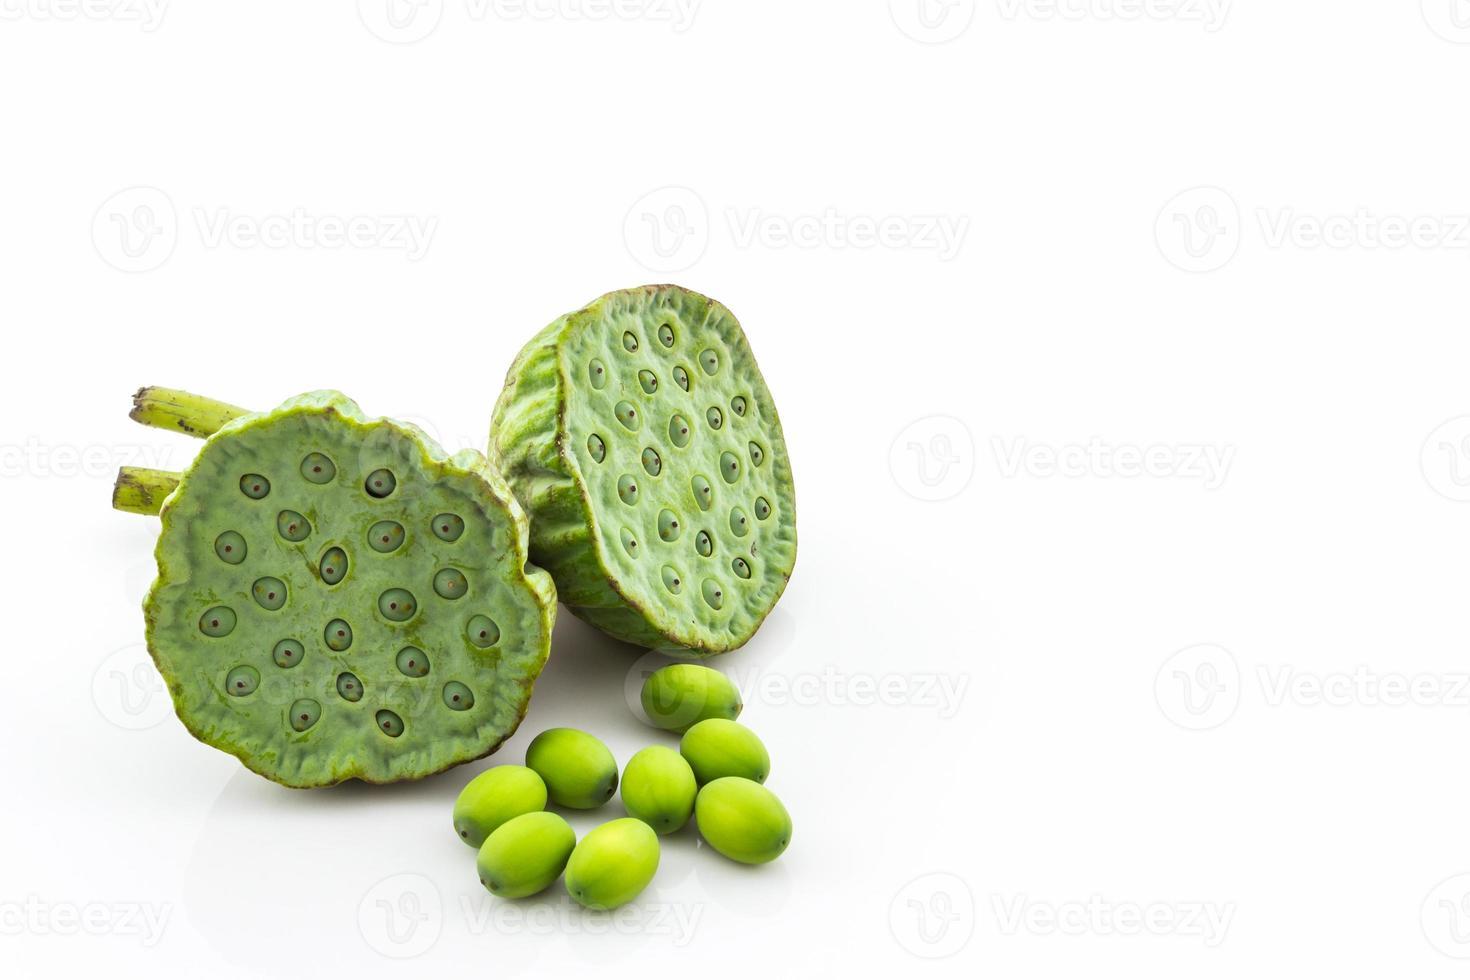 calice, semi di loto verde. foto